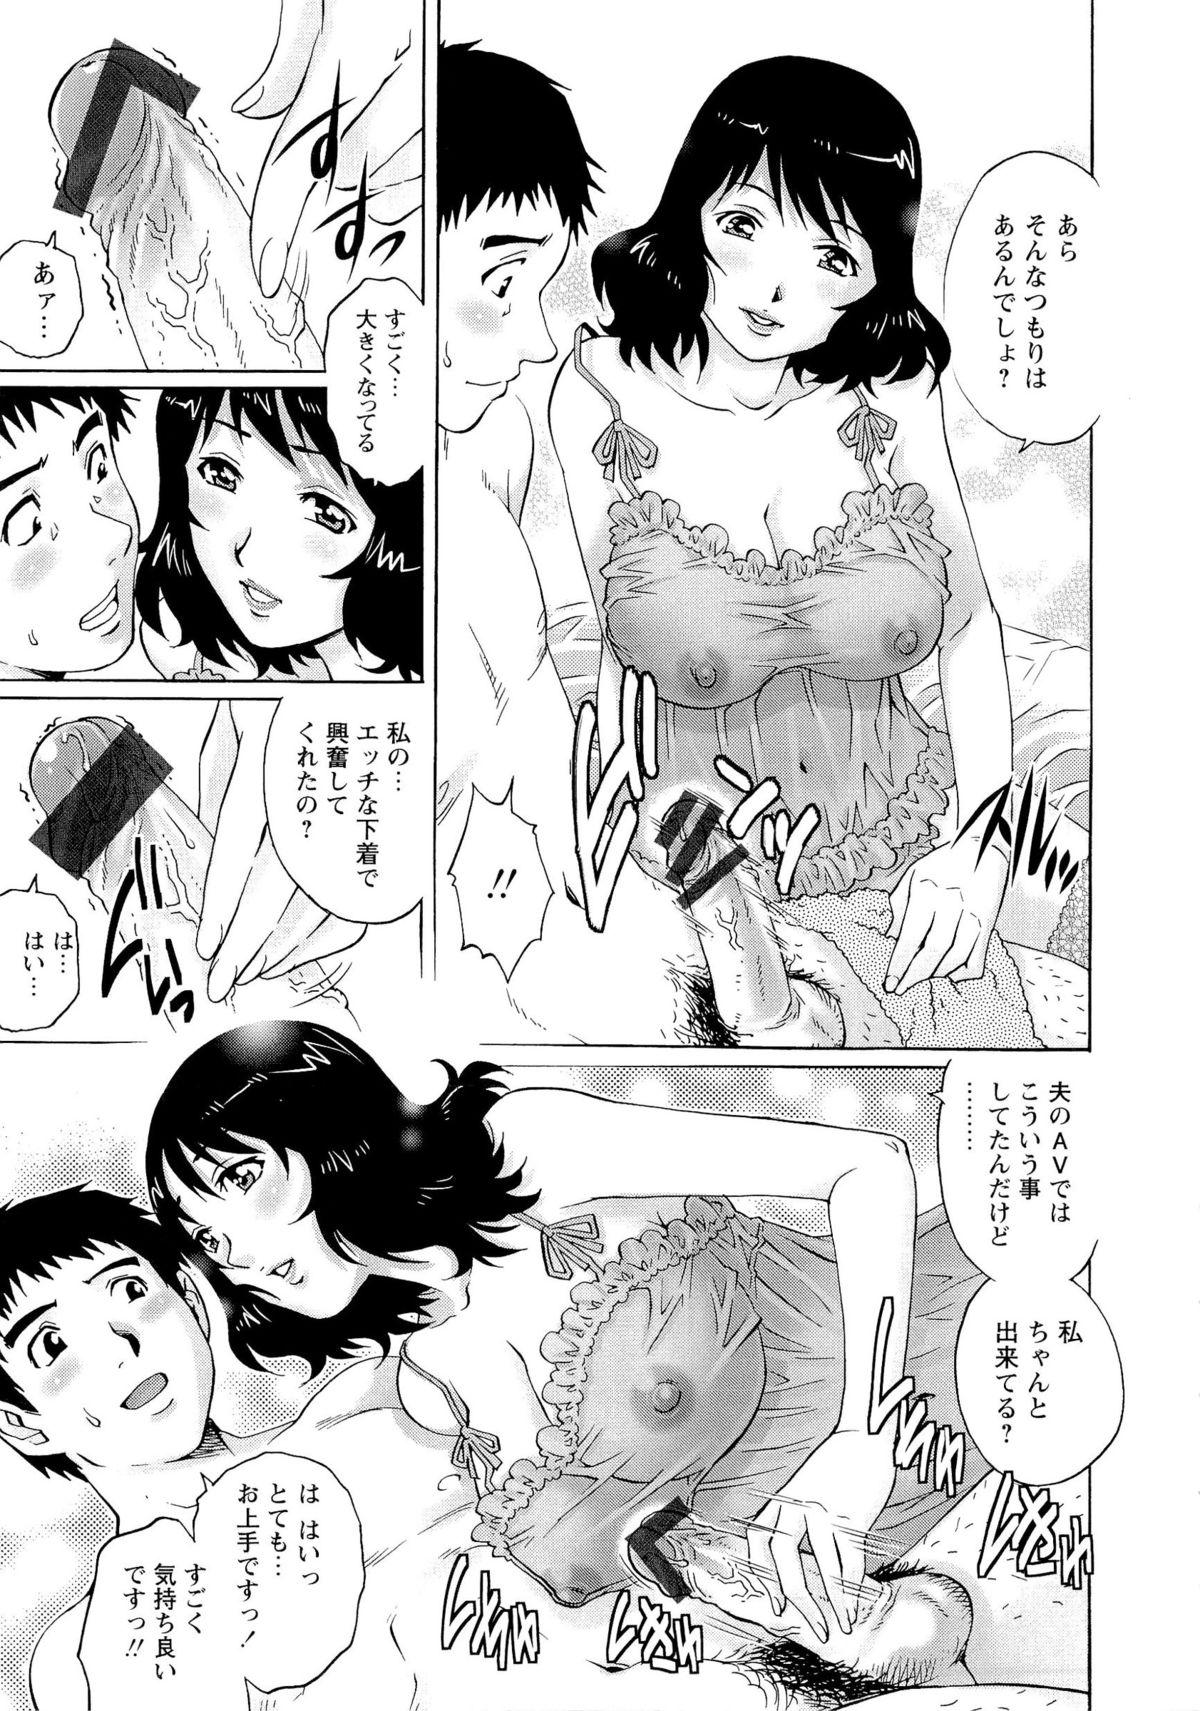 Nureteru Hitozuma - Wetly Wife 171